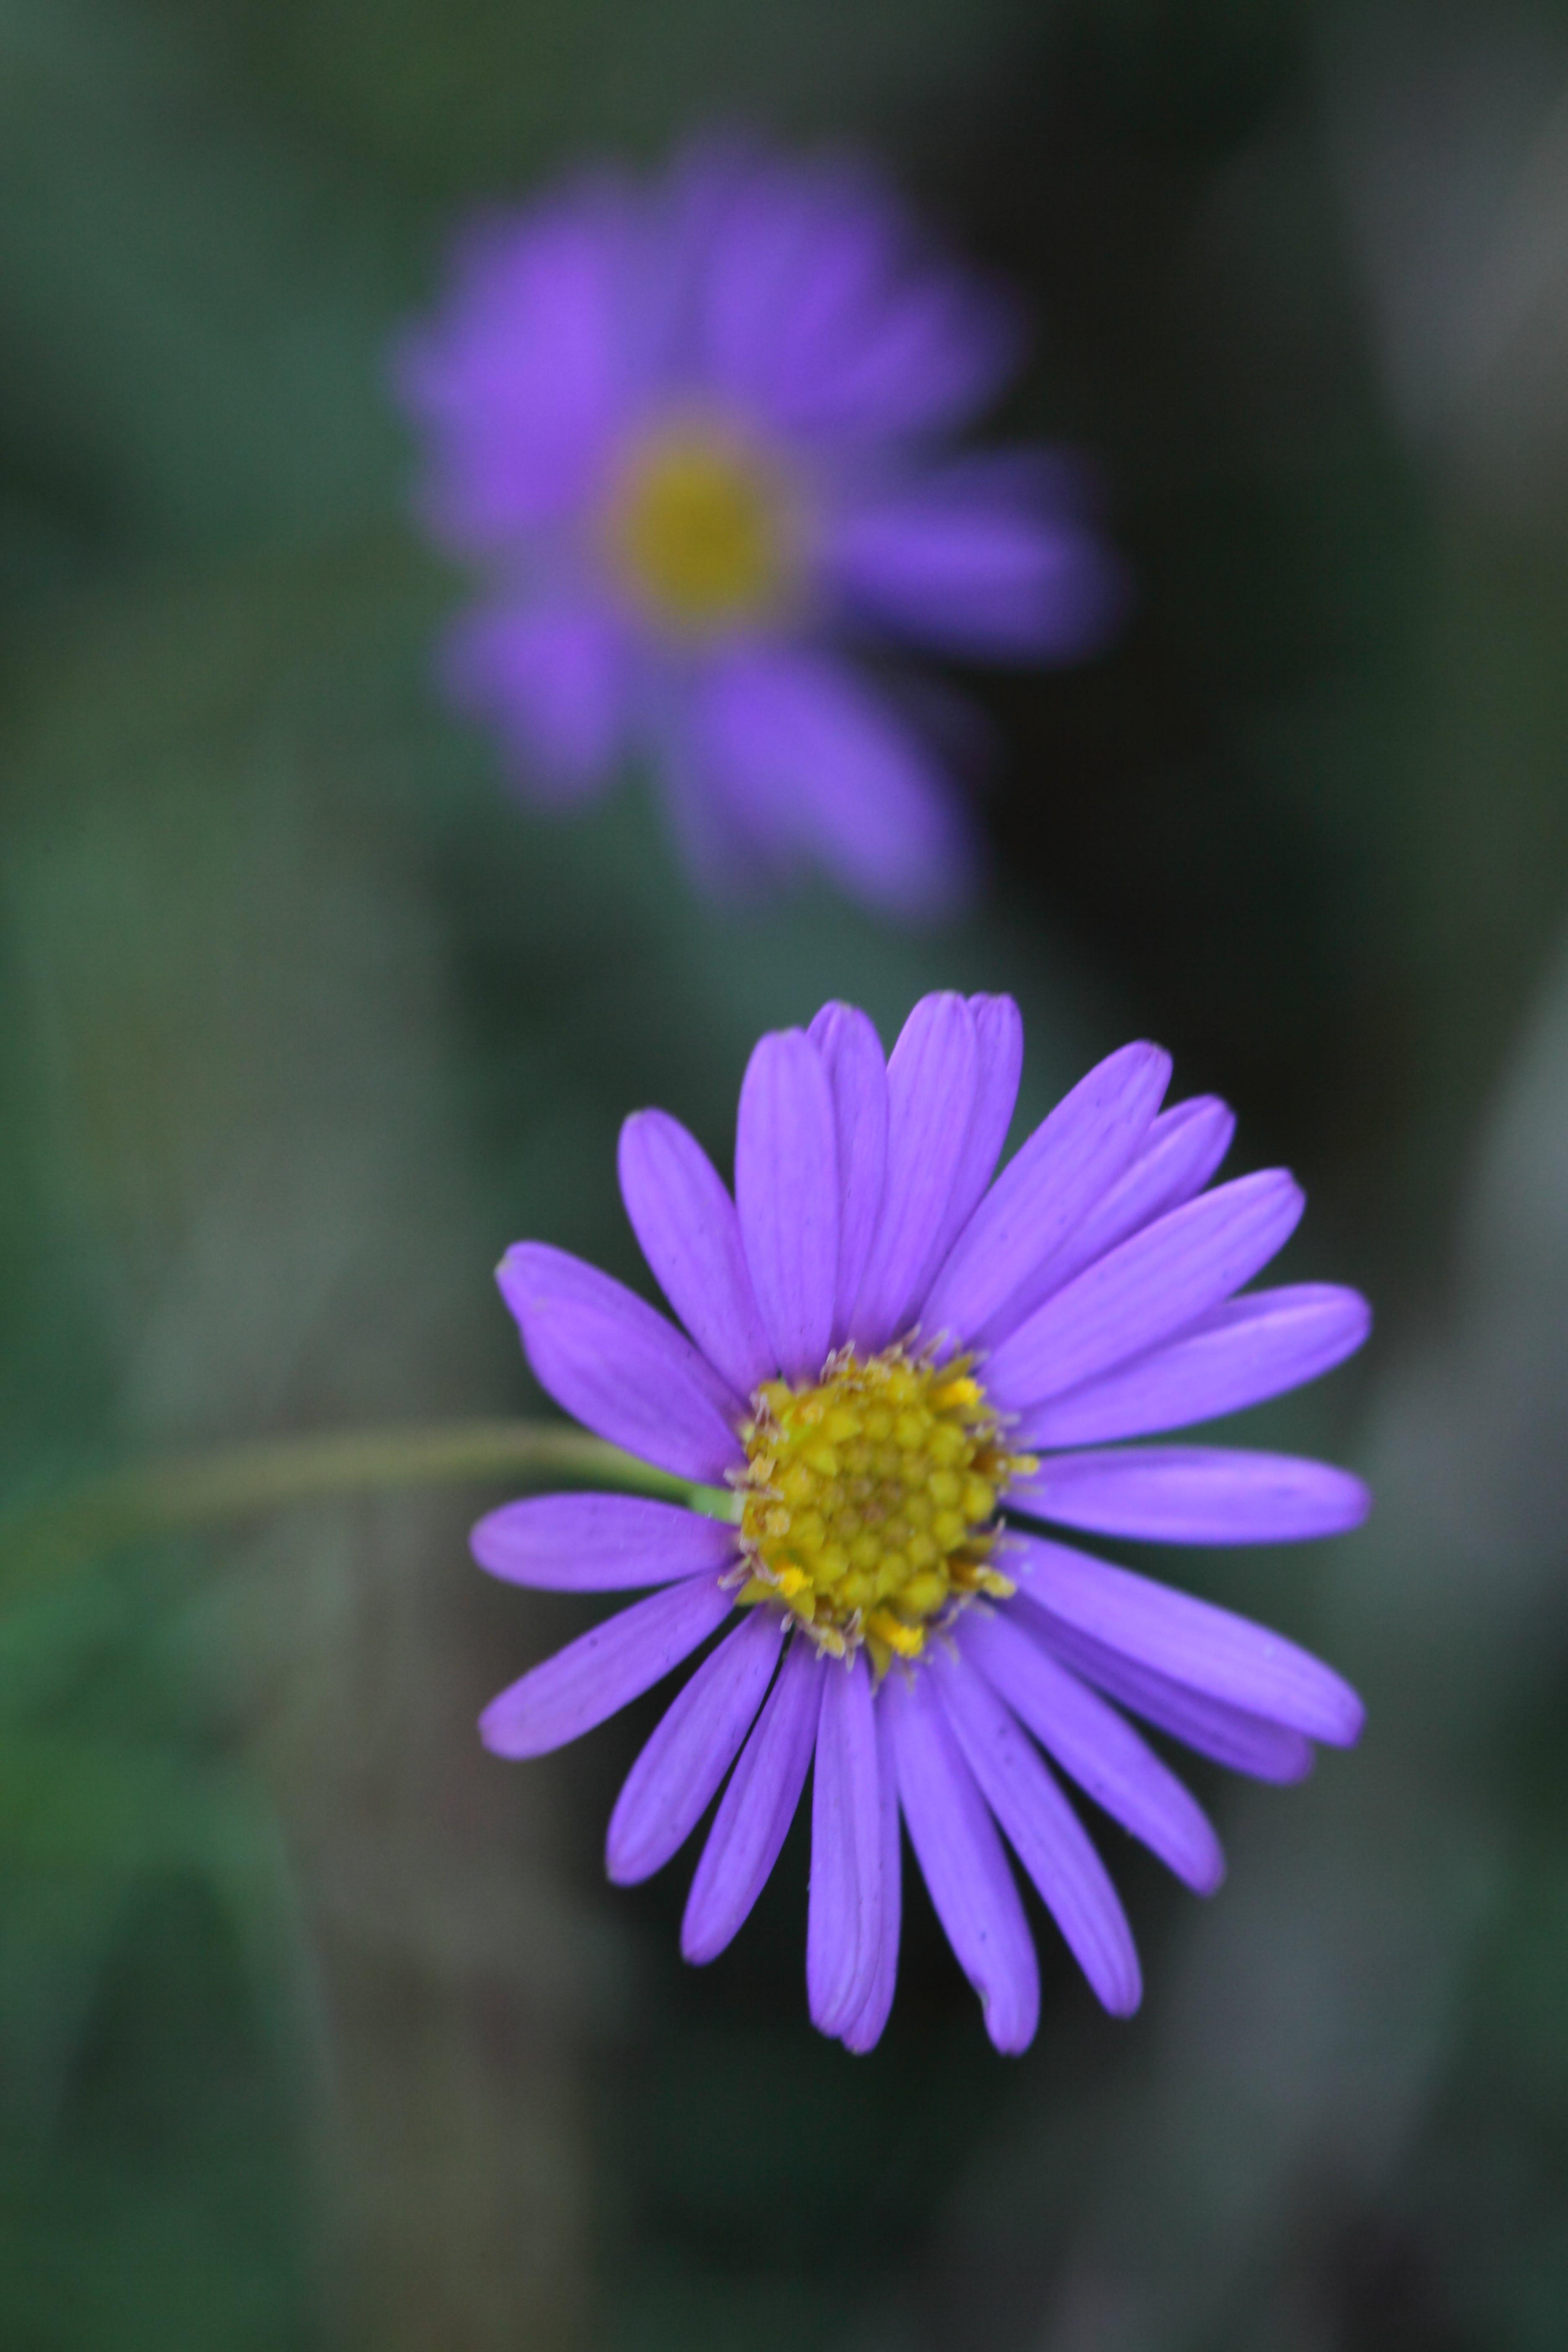 Close Up Photography of Purple Multi Petaled Flower